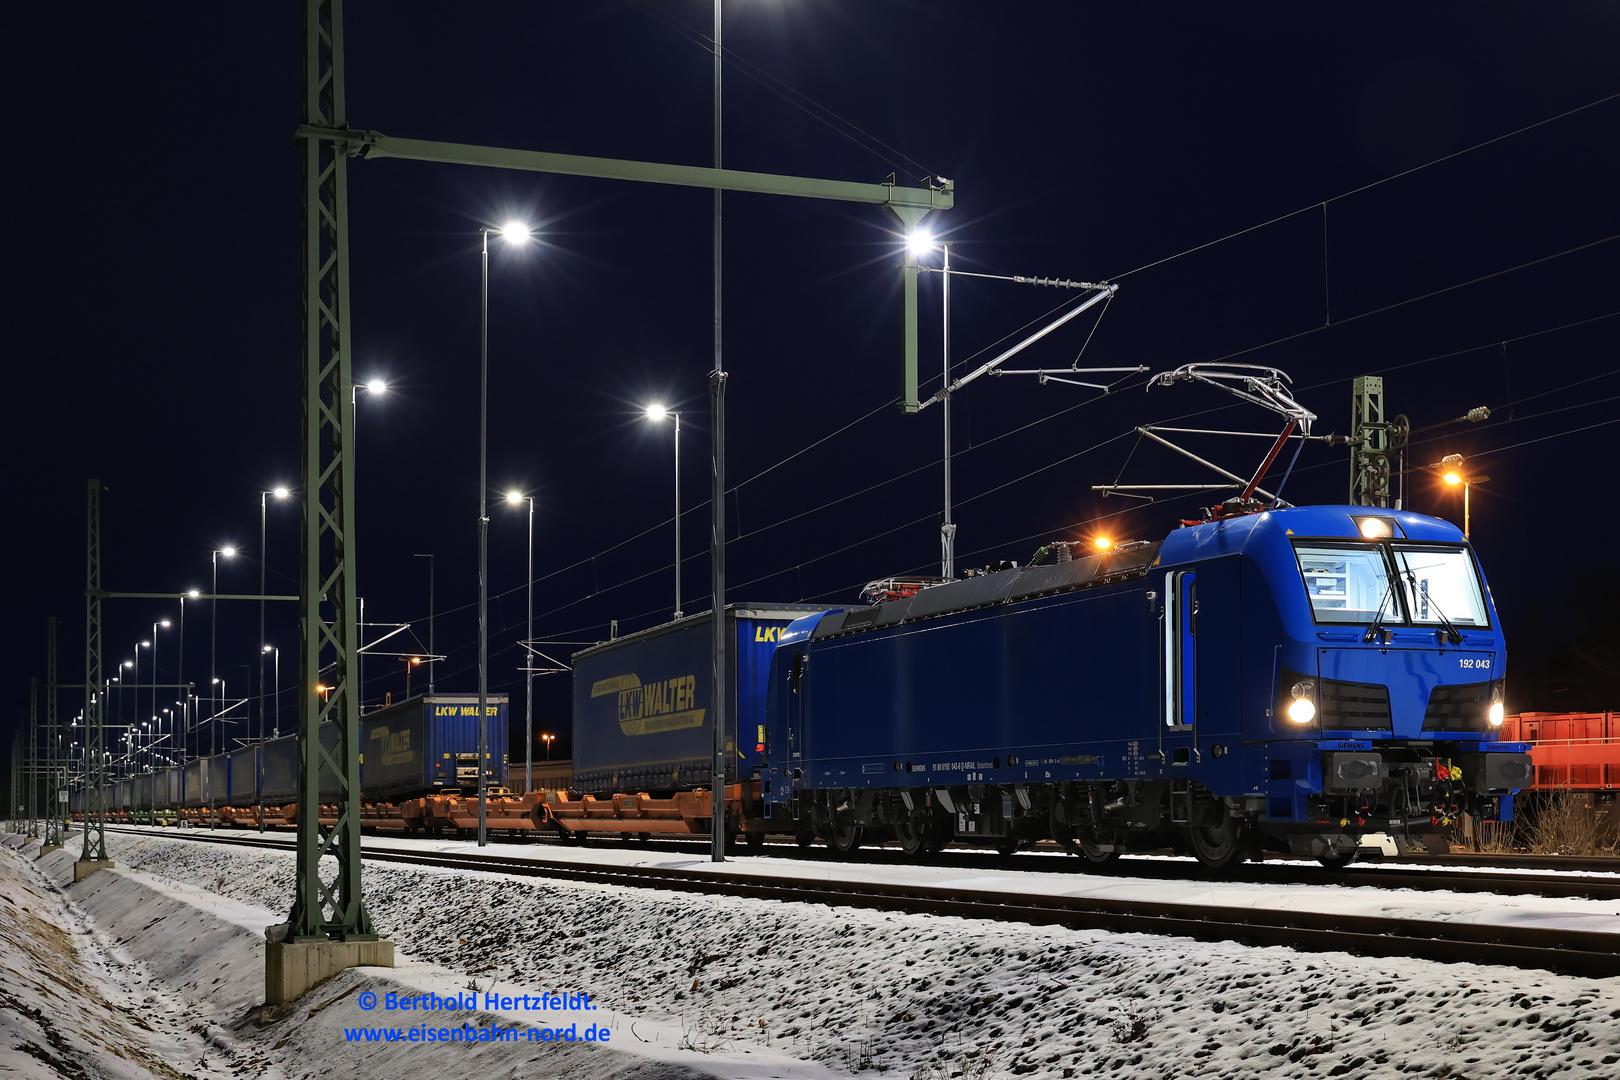 Siemens Smartron